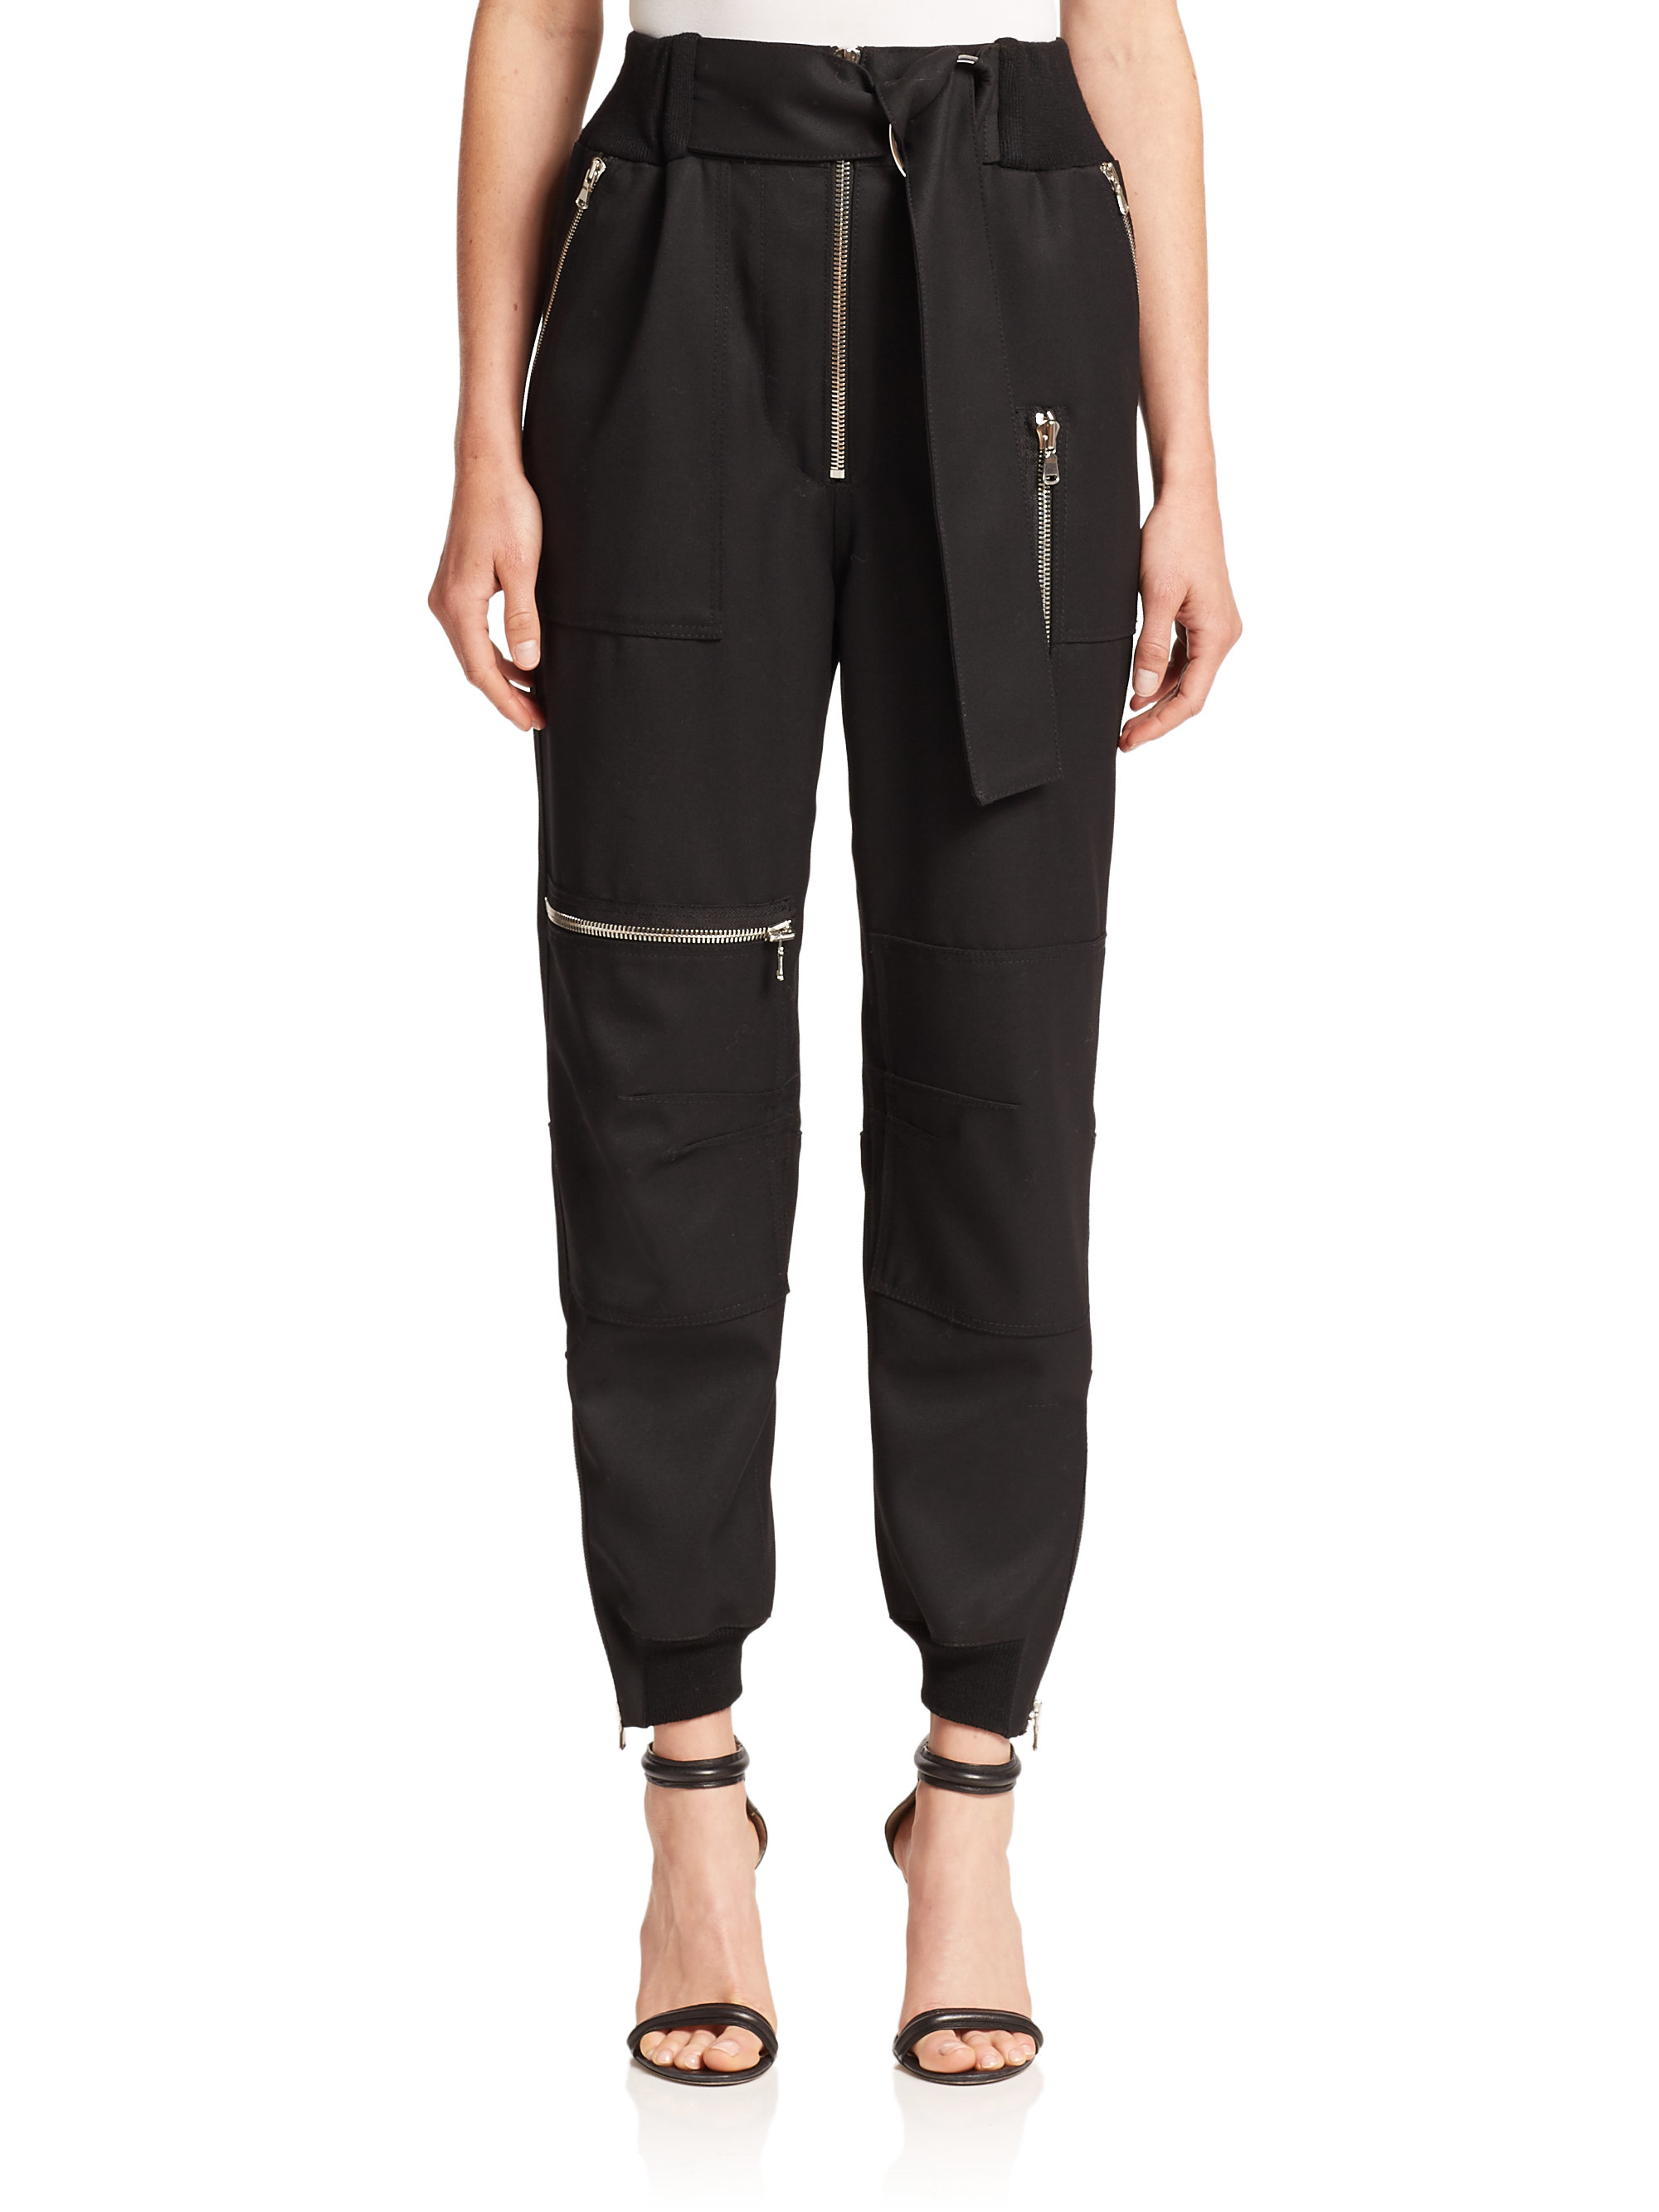 Lyst - 3.1 Phillip Lim Wool Flight Pants in Black